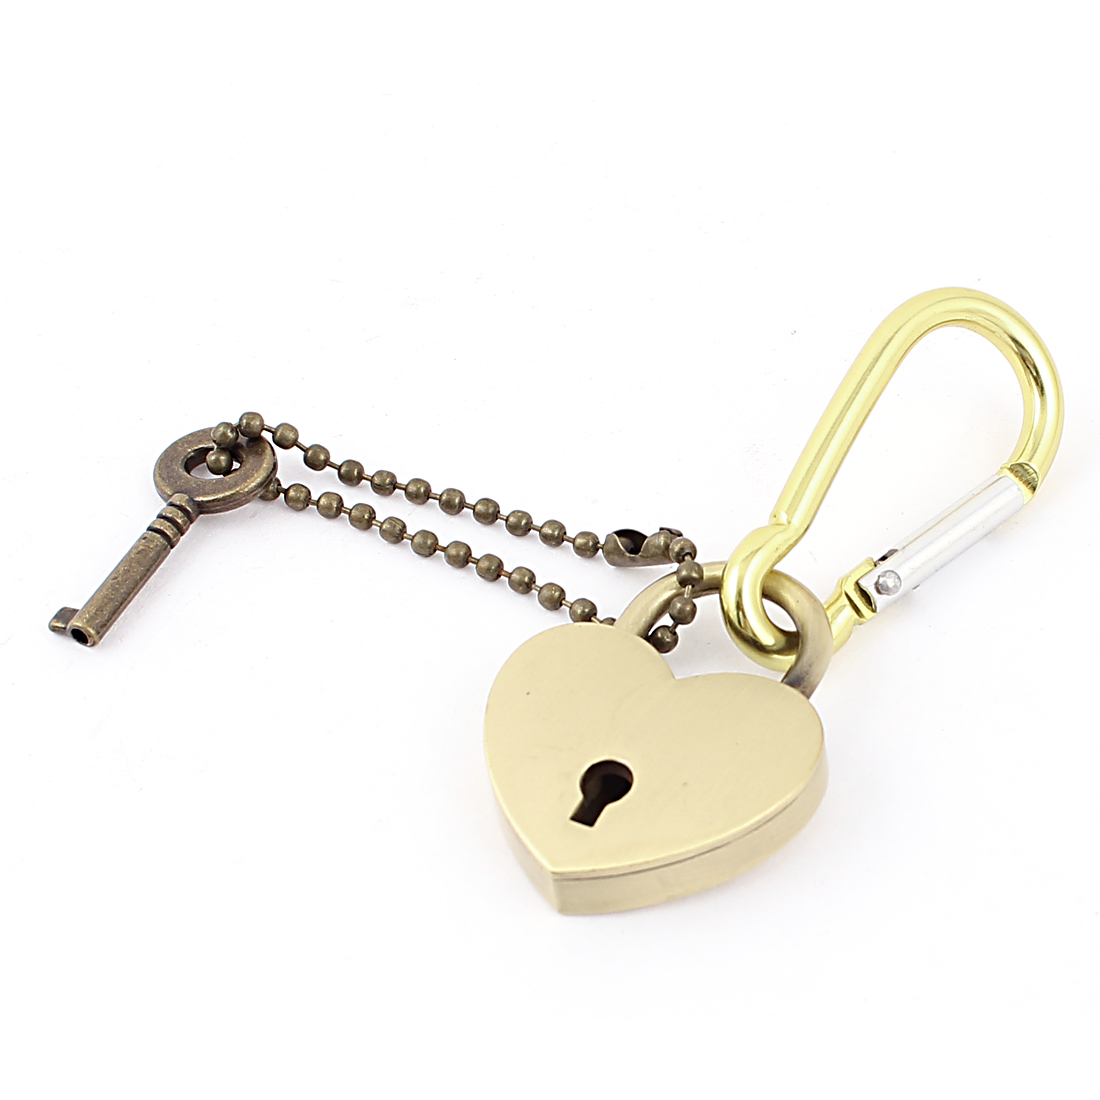 Gold Tone Metal Heart Lock Pendant Carabiner Clip Clamp Buckle Keyring Key Holder